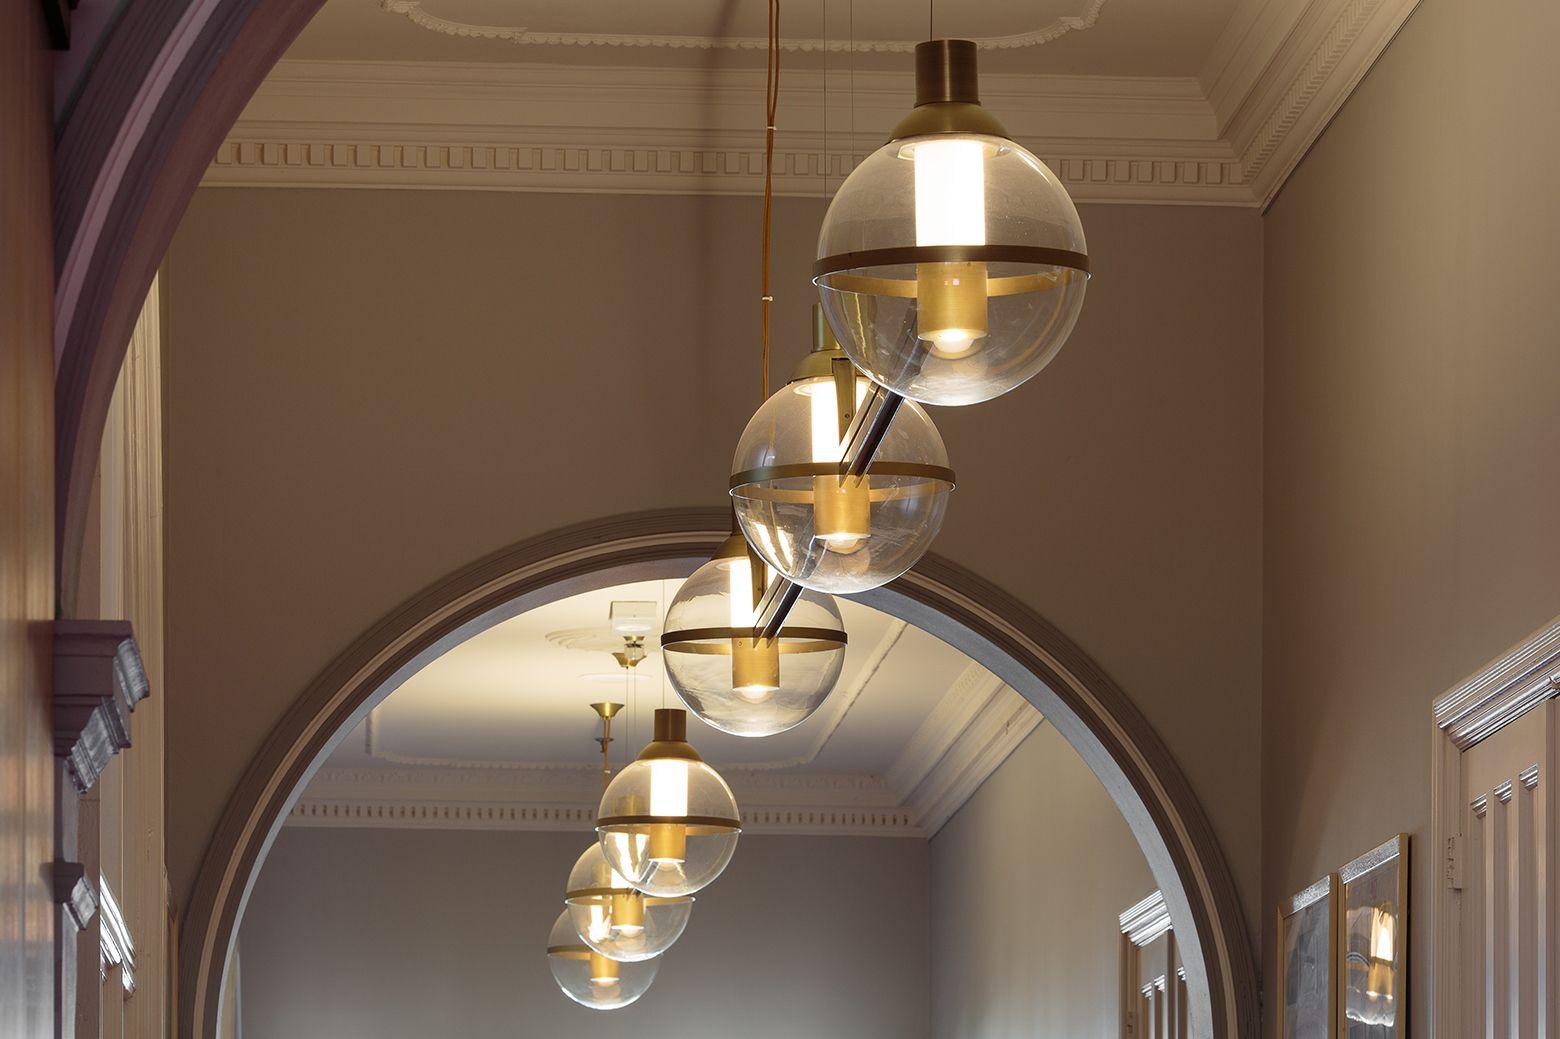 Aglo Systems Hallway Feature Lights Cranbrook School